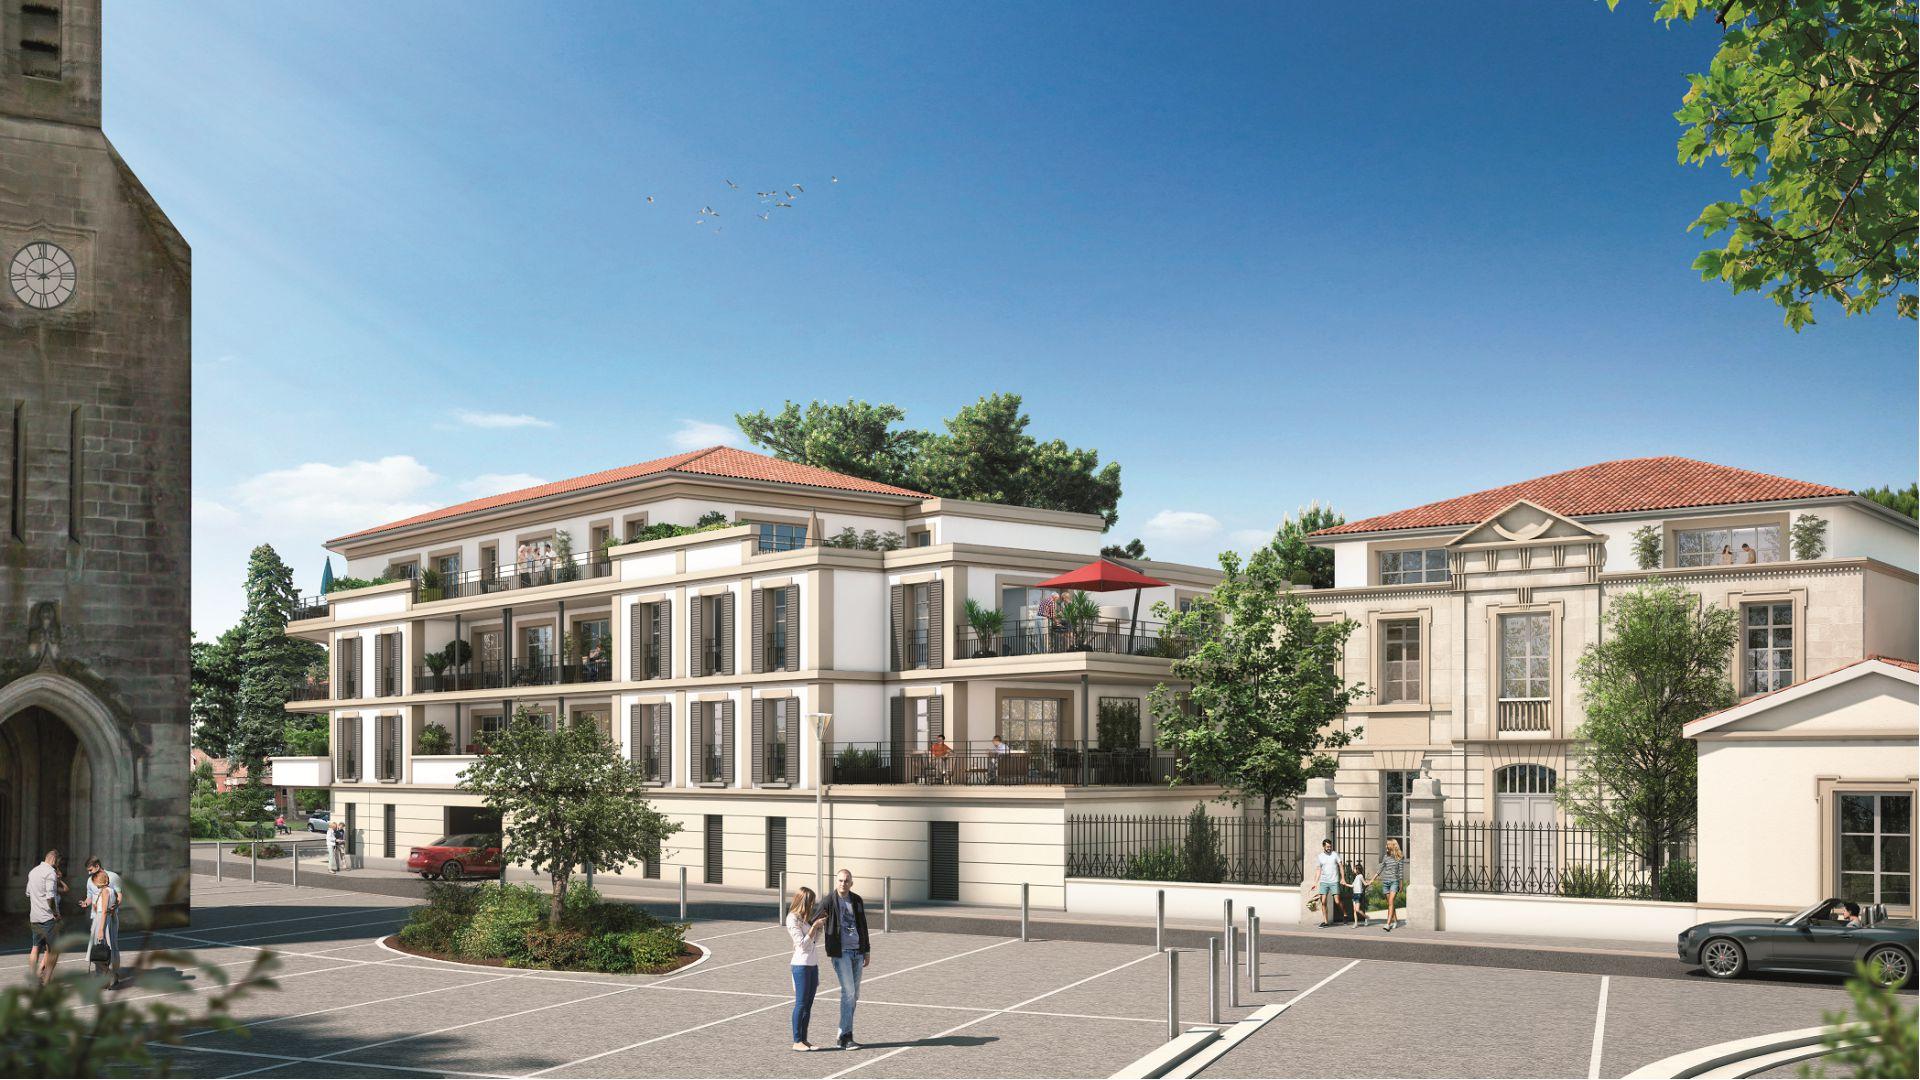 GreenCity immobilier - Biscarrosse - 40 600 - appartements du T1Bis au T4